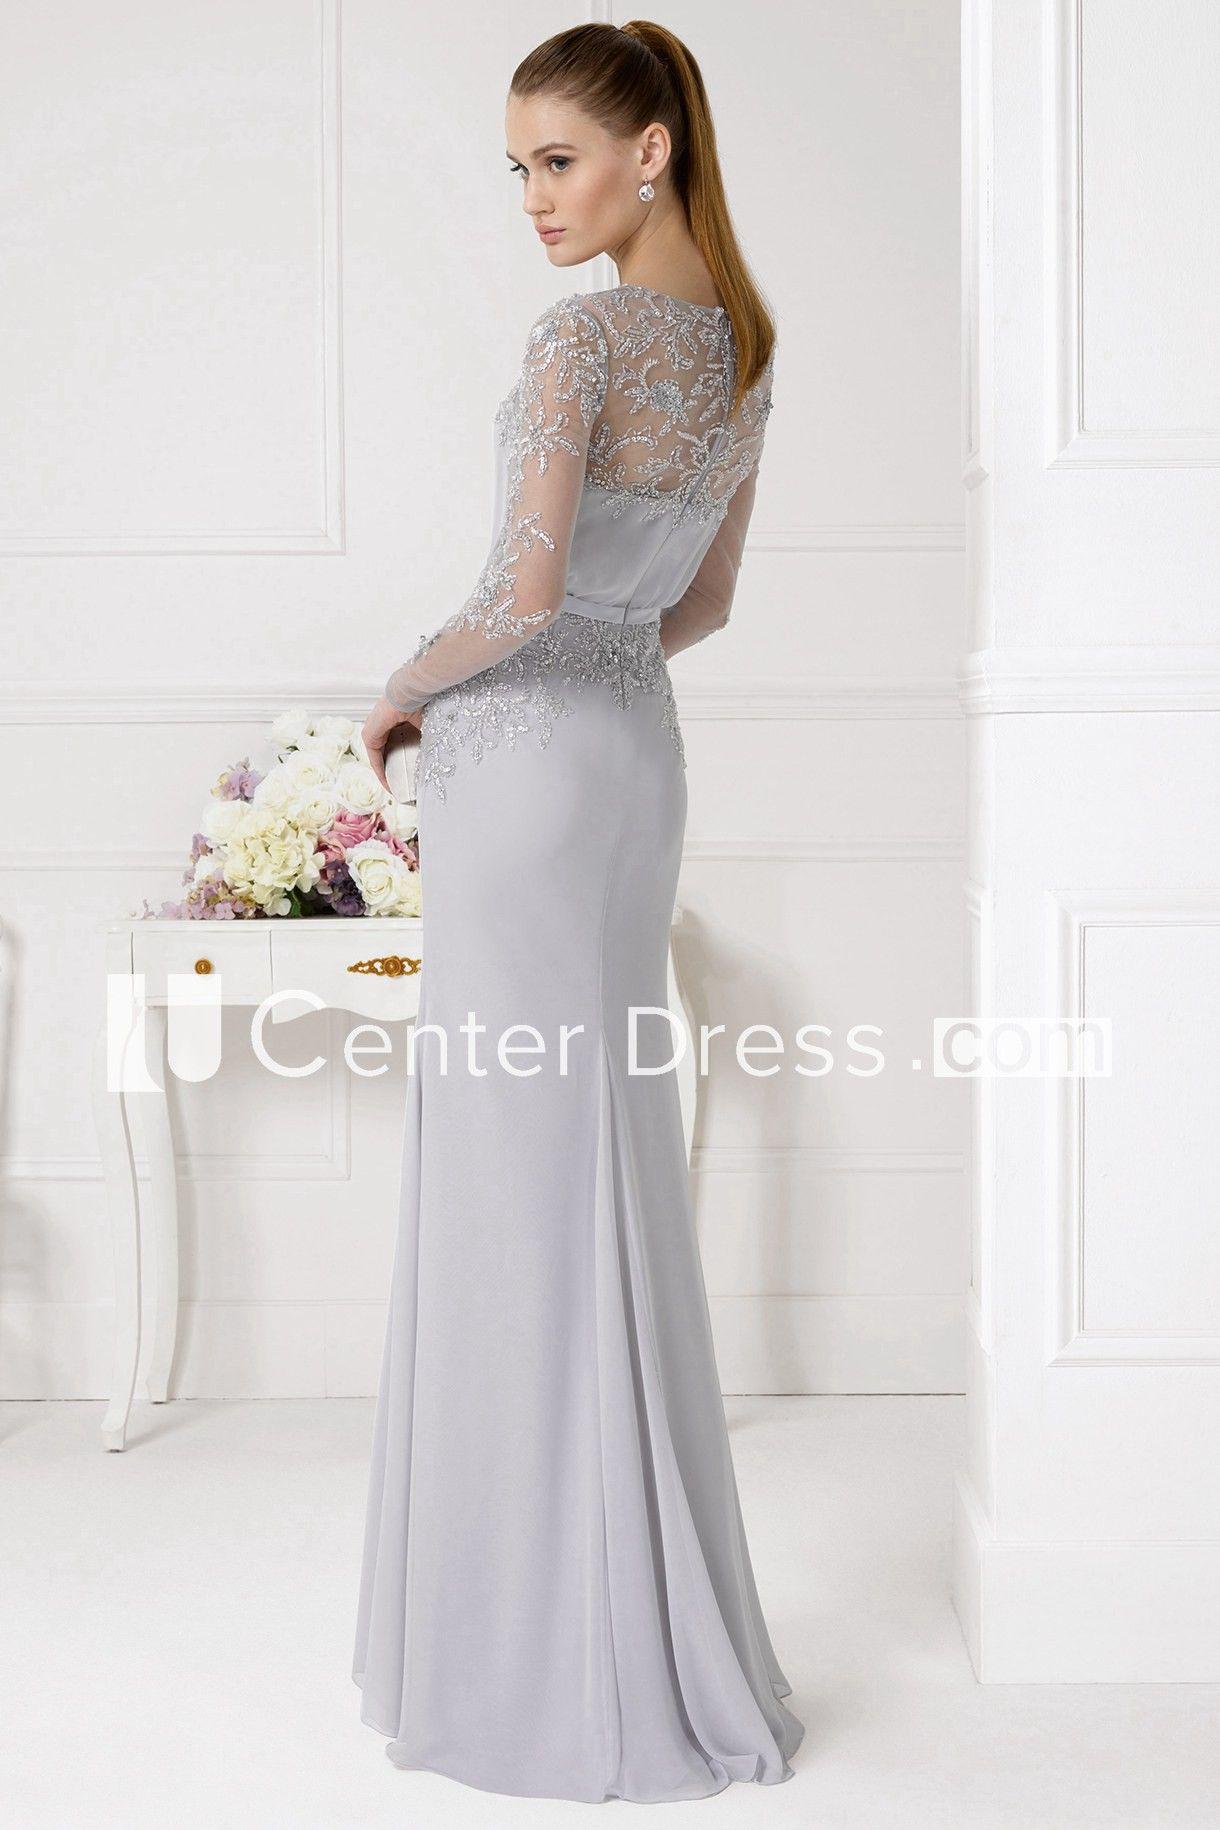 69dcf53731a8 Sheath Beaded Jewel Neck Illusion Sleeve Chiffon Prom Dress - UCenter Dress